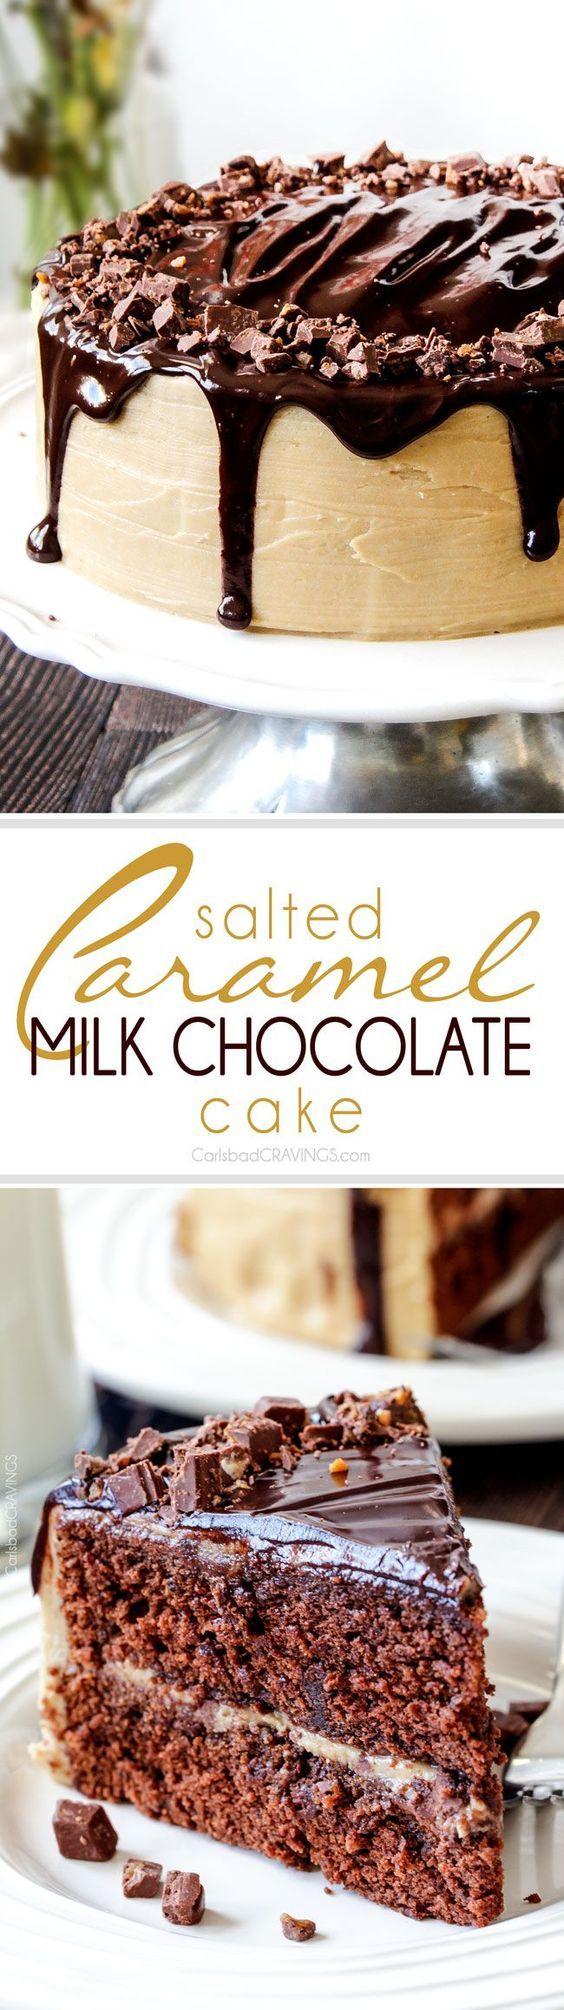 Salted Caramel Milk Chocolate Cake 1 hr to make, serves 12